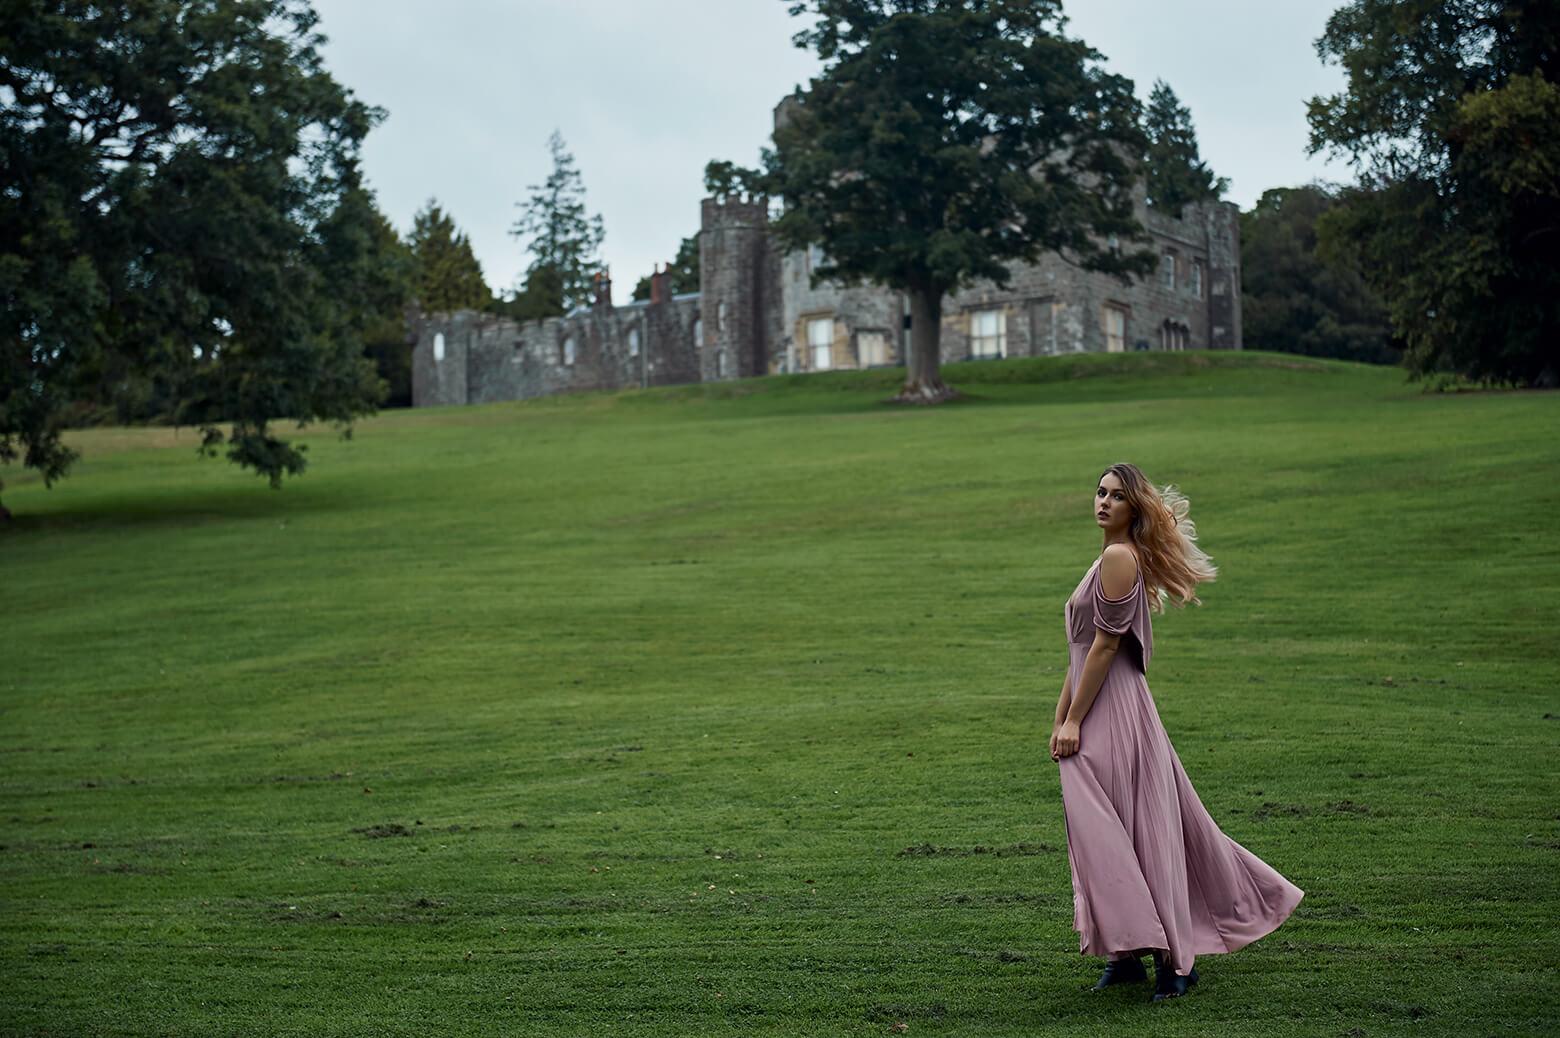 scotland, photography, ursula schmitz, portrait, destination, dream photo shoot, united kingdom, großbrittanien, urlaub, travel, fotografie